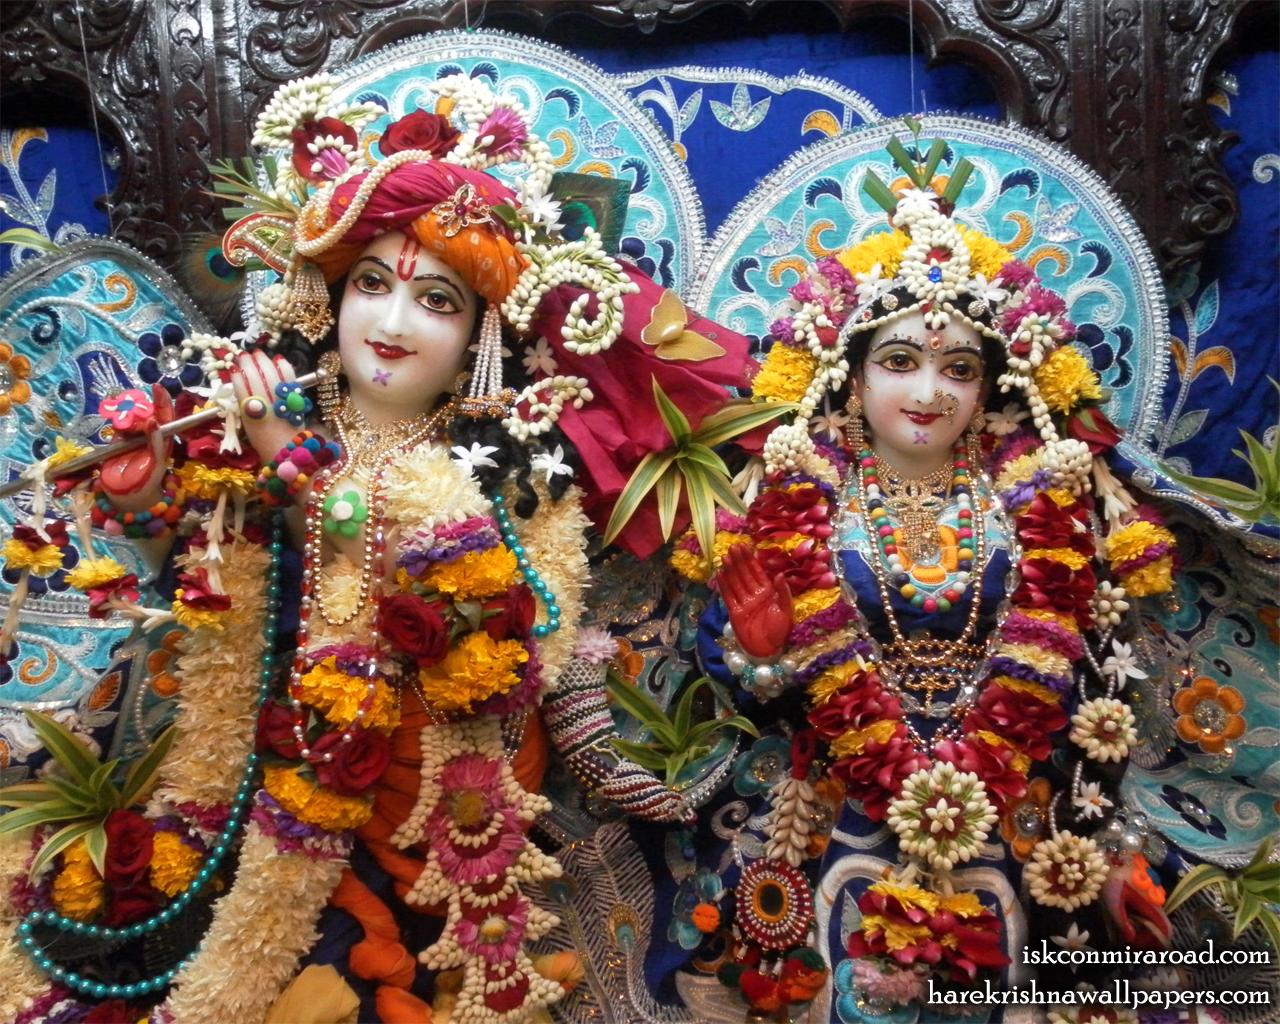 Sri Sri Radha Giridhari Close up Wallpaper (018) Size 1280x1024 Download